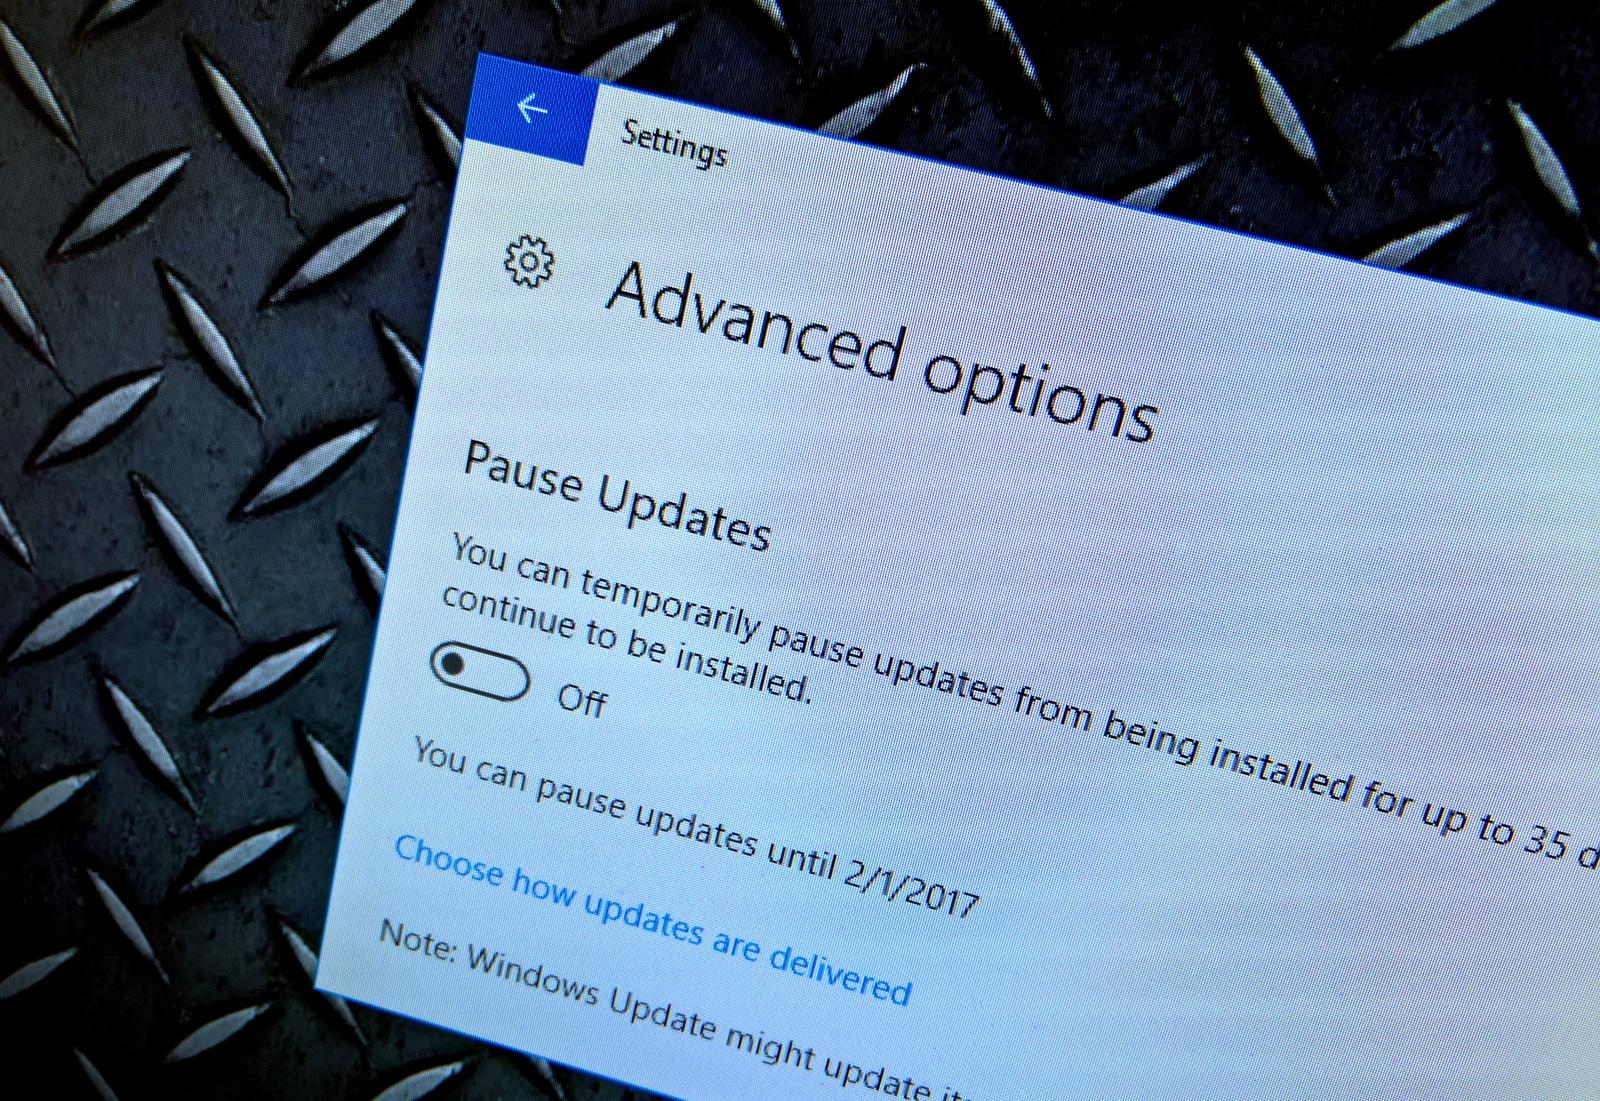 Pause Update settings on Windows 10